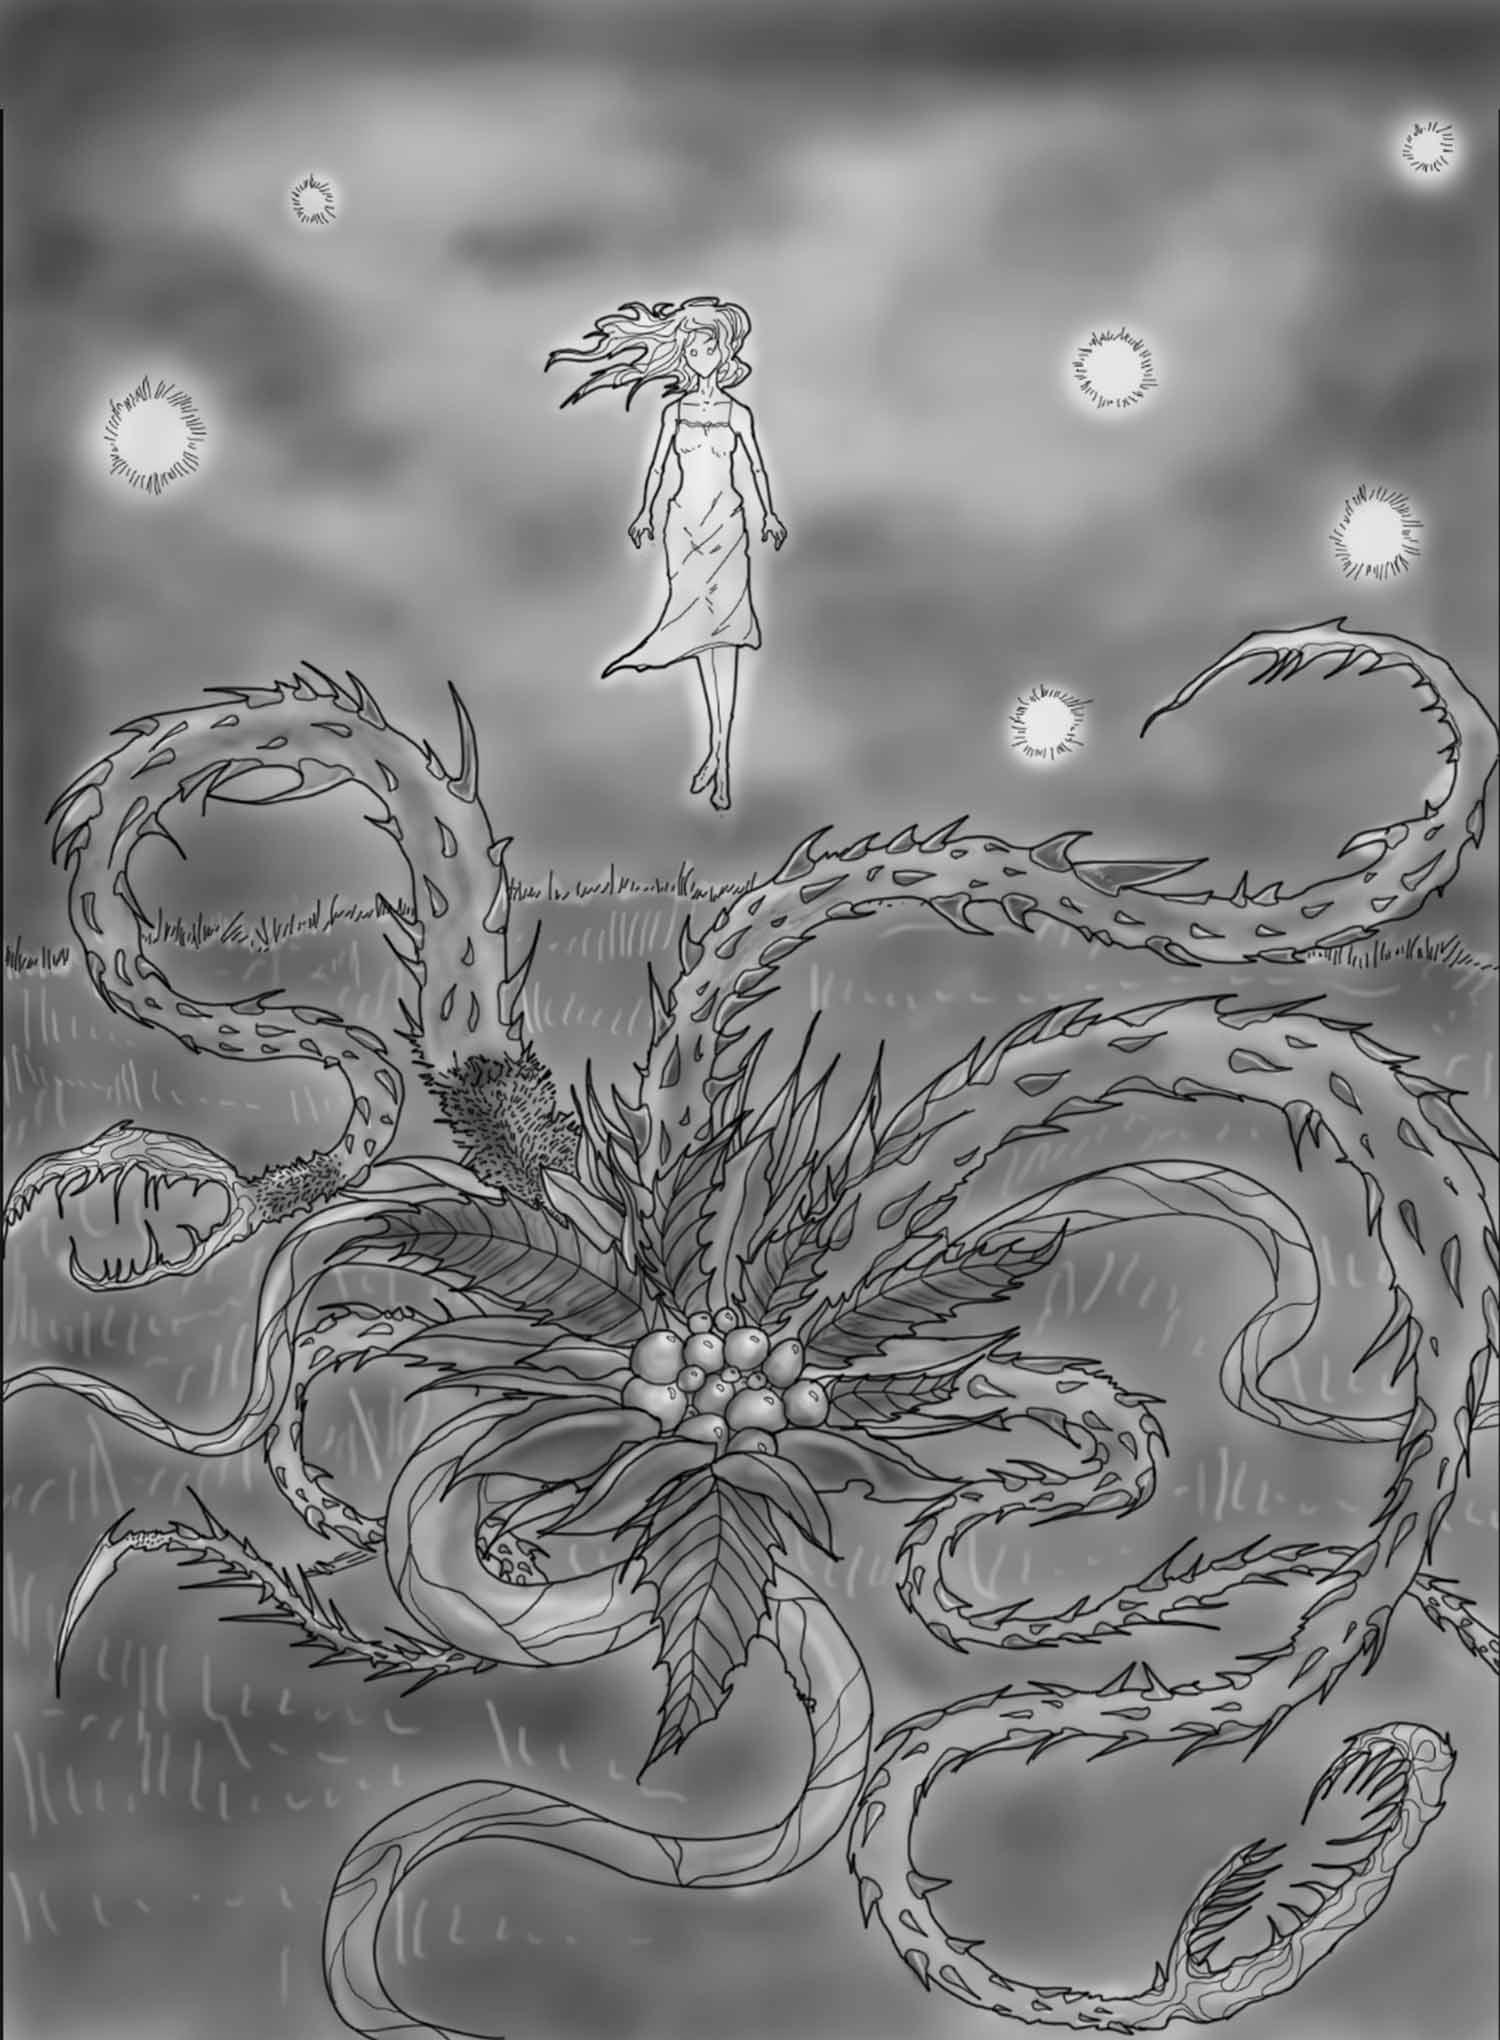 jade-chapter-5-2.jpg